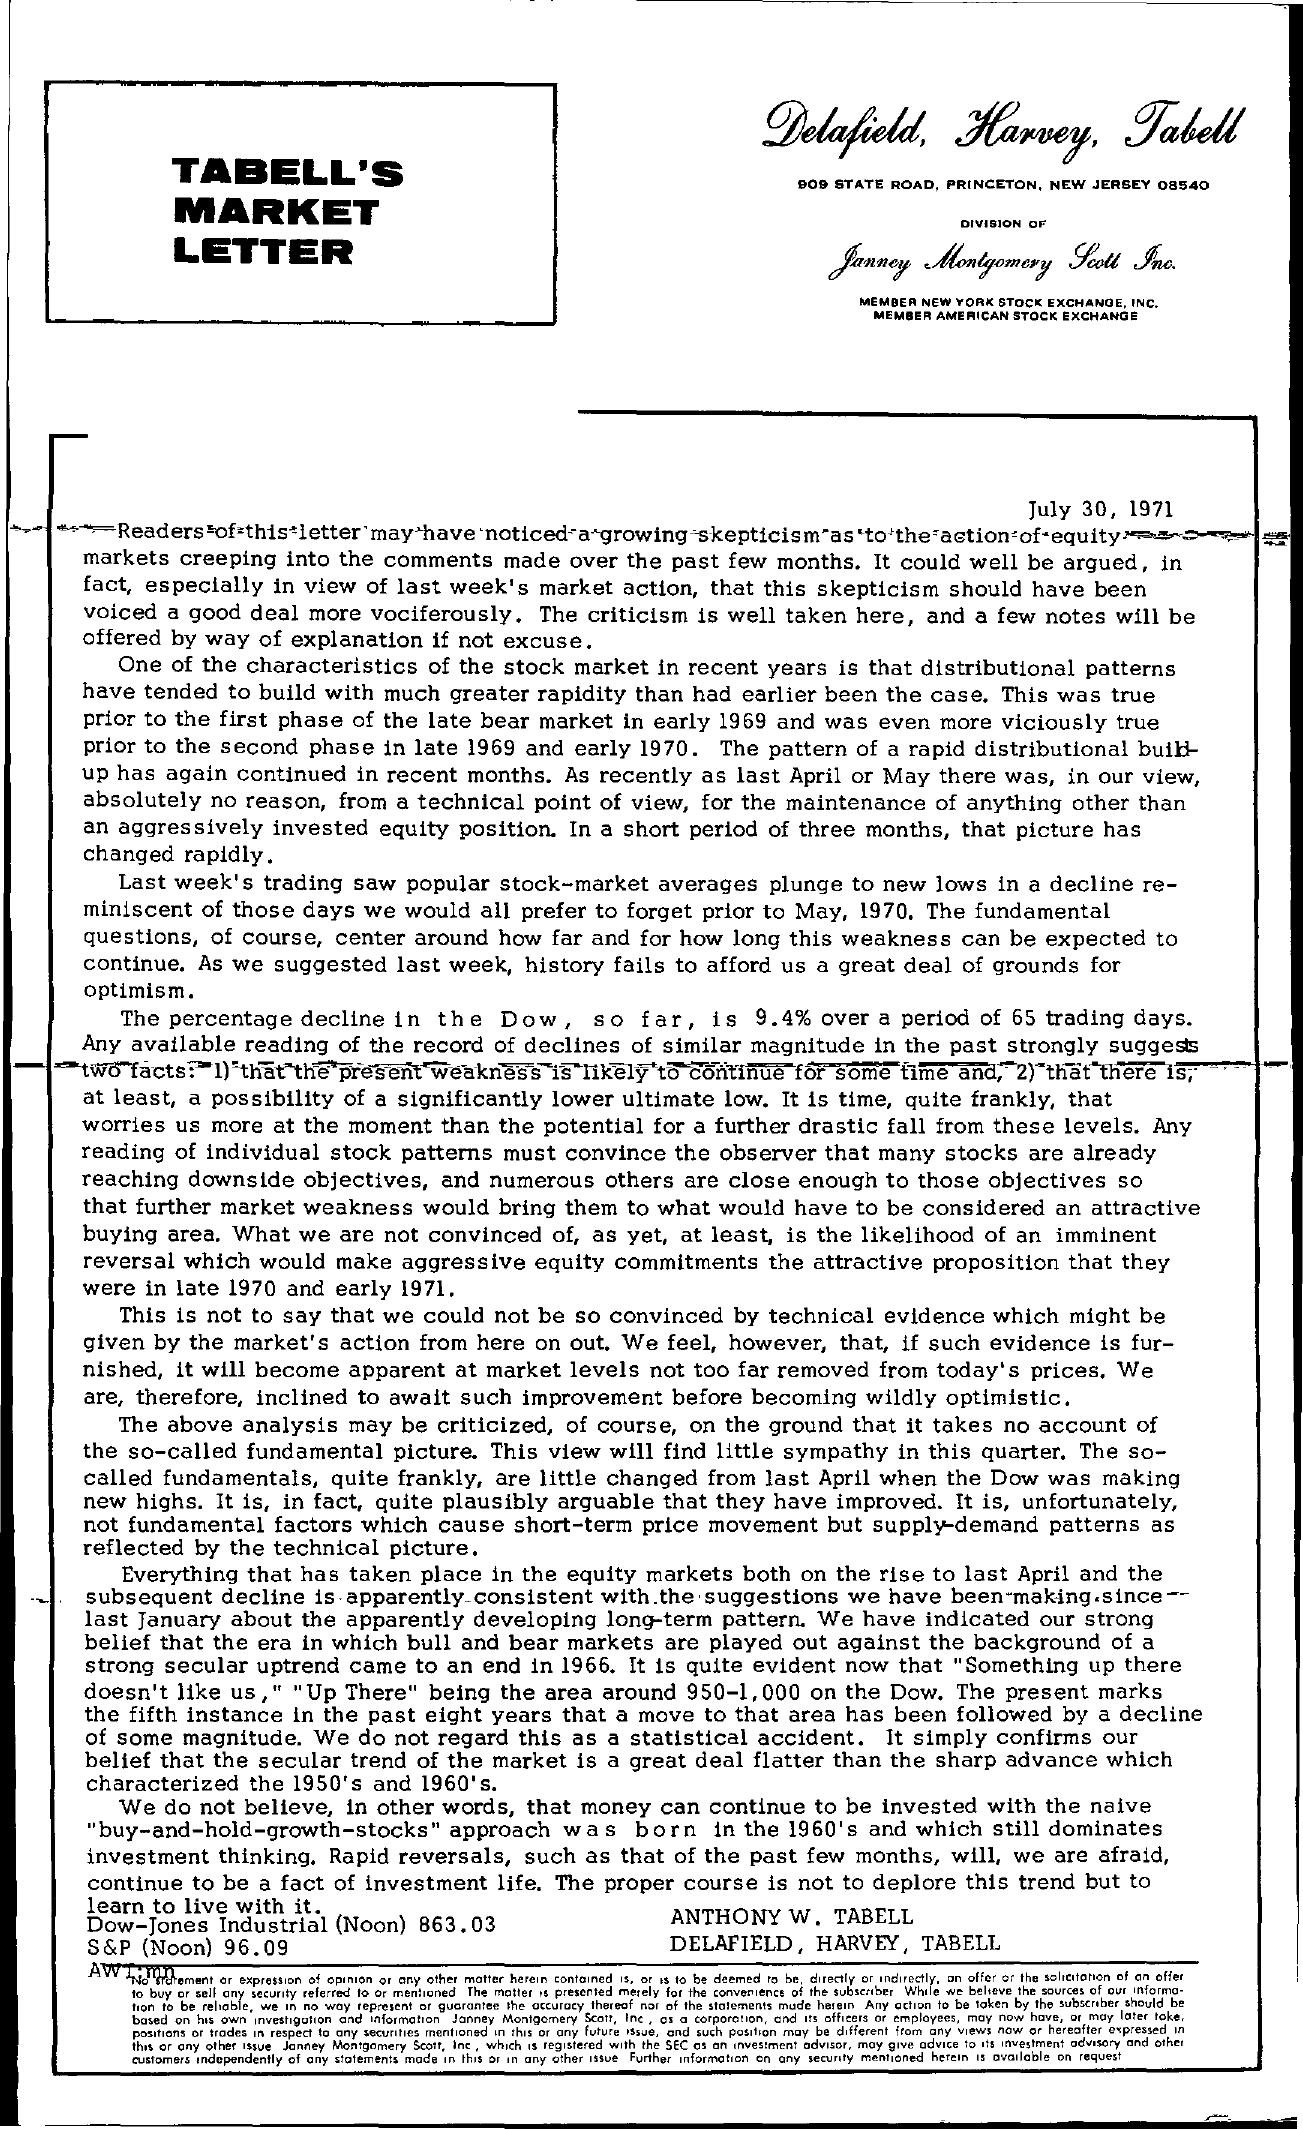 Tabell's Market Letter - July 30, 1971